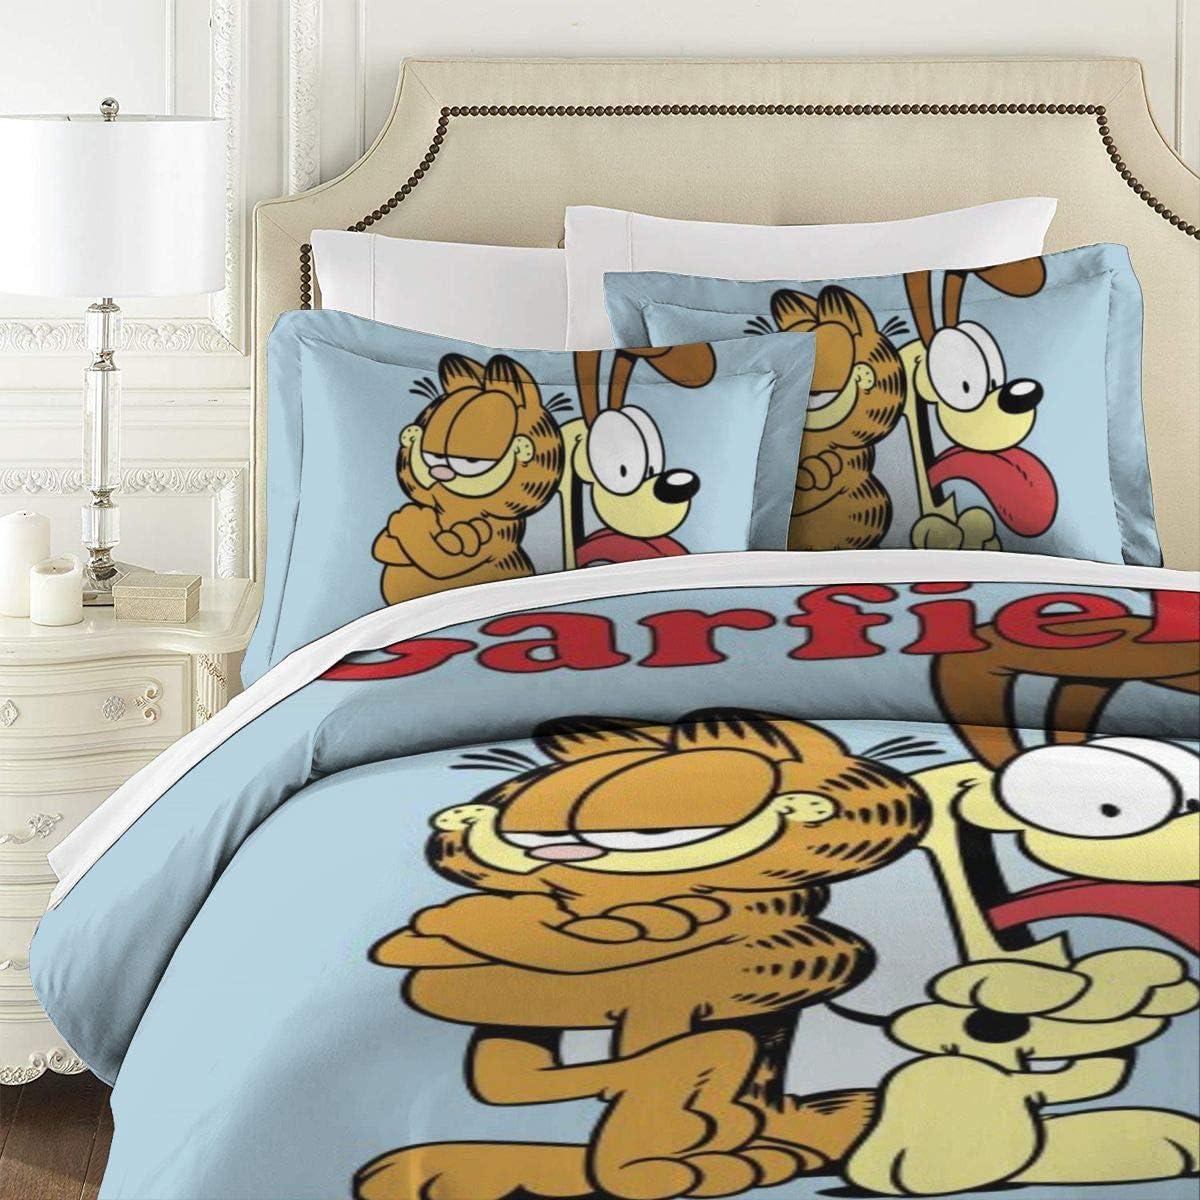 Amazon Com Nvsdt Garfield 3 Piece Kids Bed Set Bedding Printed Comforter Set With 2 Pillow Shams Zipper Closure Super Soft Microfiber Bed Set 86 X70 Home Kitchen